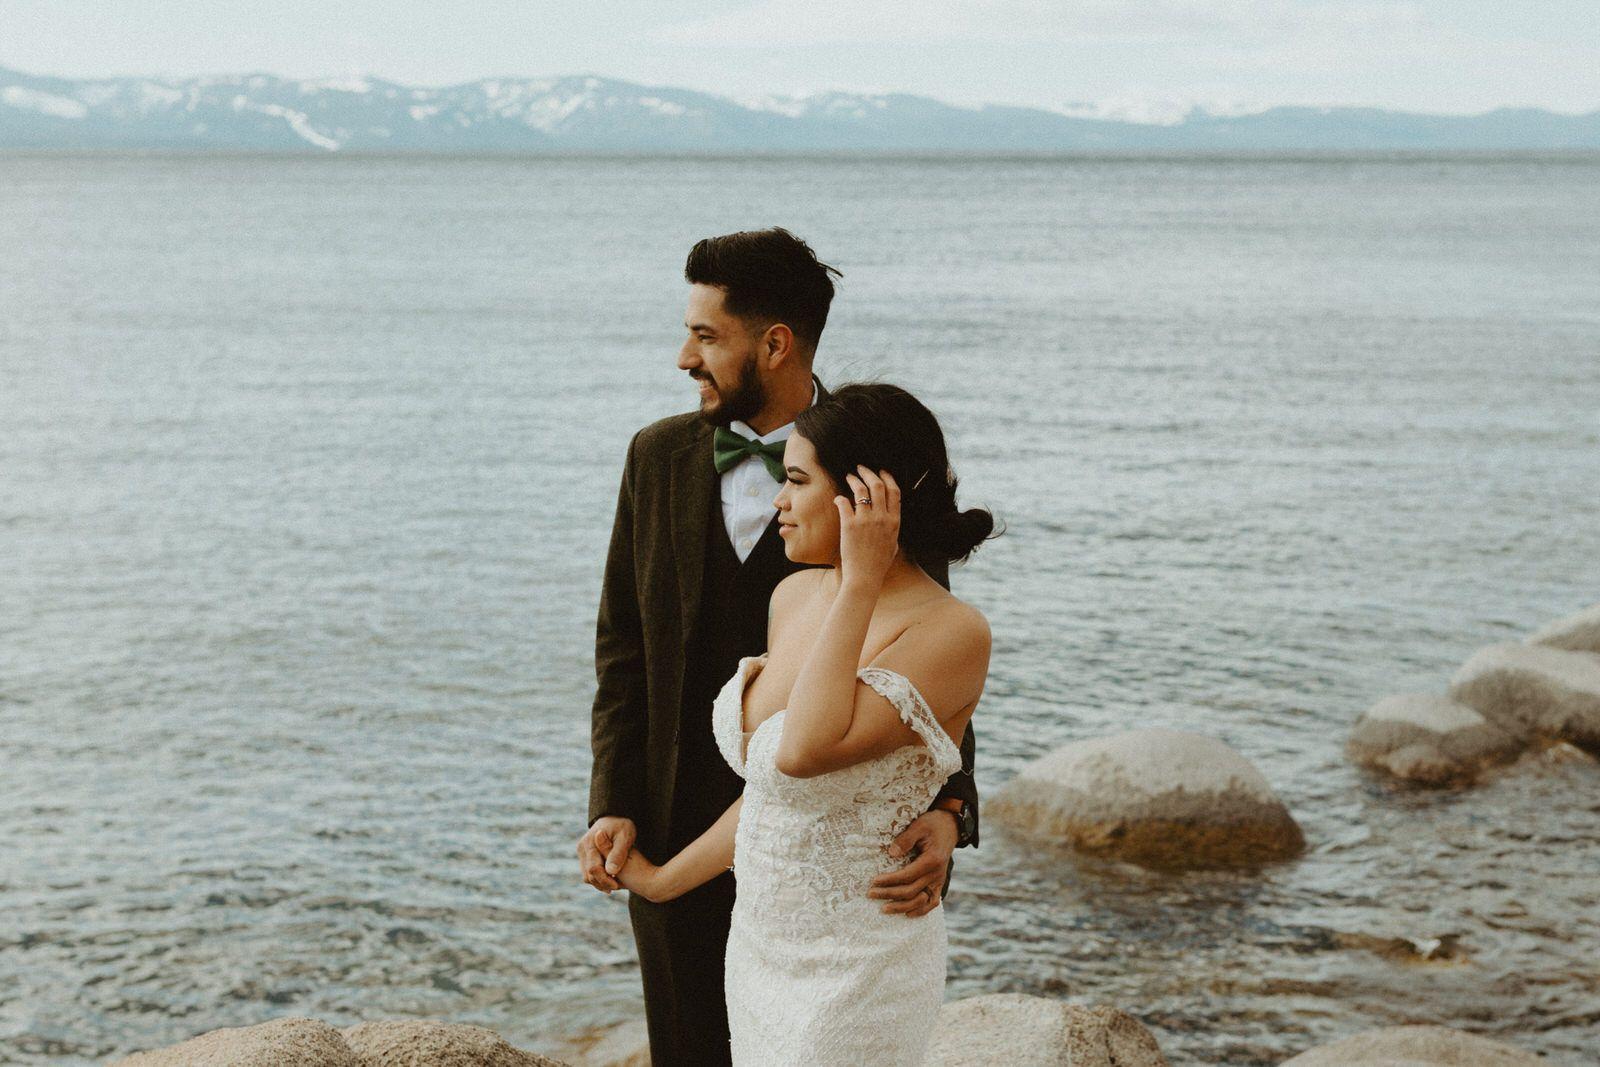 Nevada-Wedding-Photos_-Lake-Tahoe-Elopement-Photographer_-Emma-Wynn-Paul_-0259-large